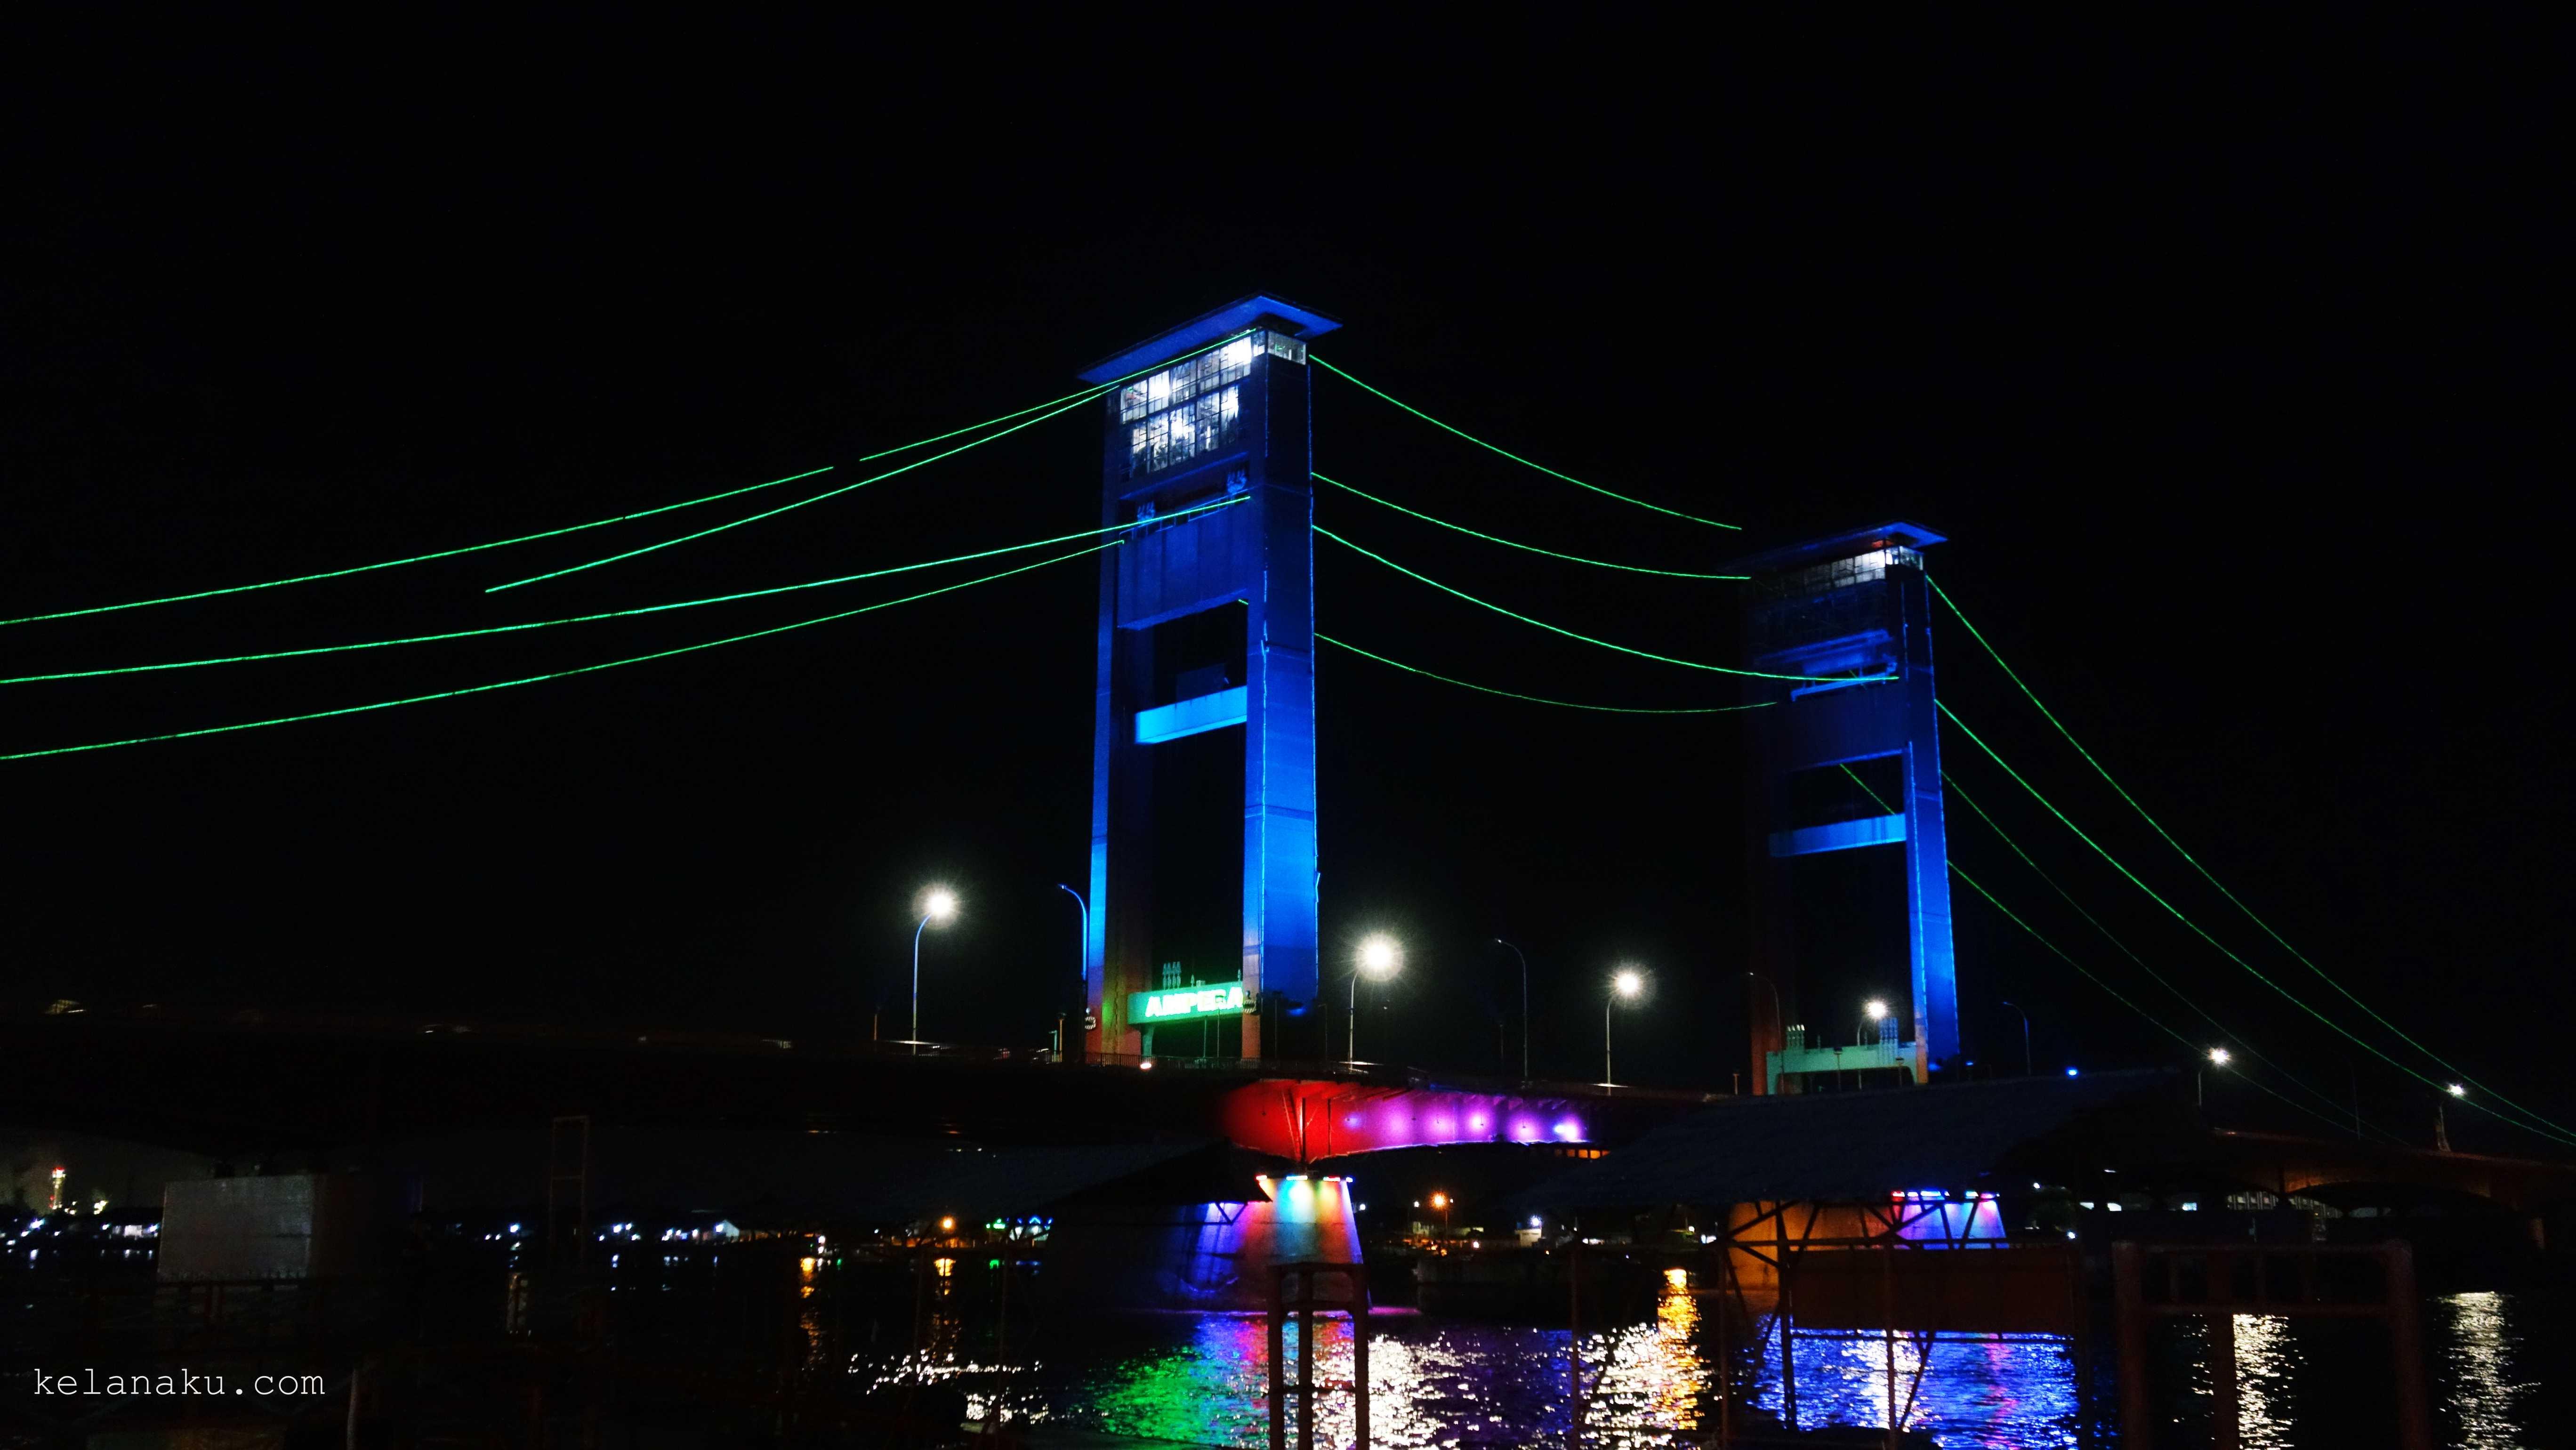 7 Tempat Wisata Di Kota Palembang - Kelanaku